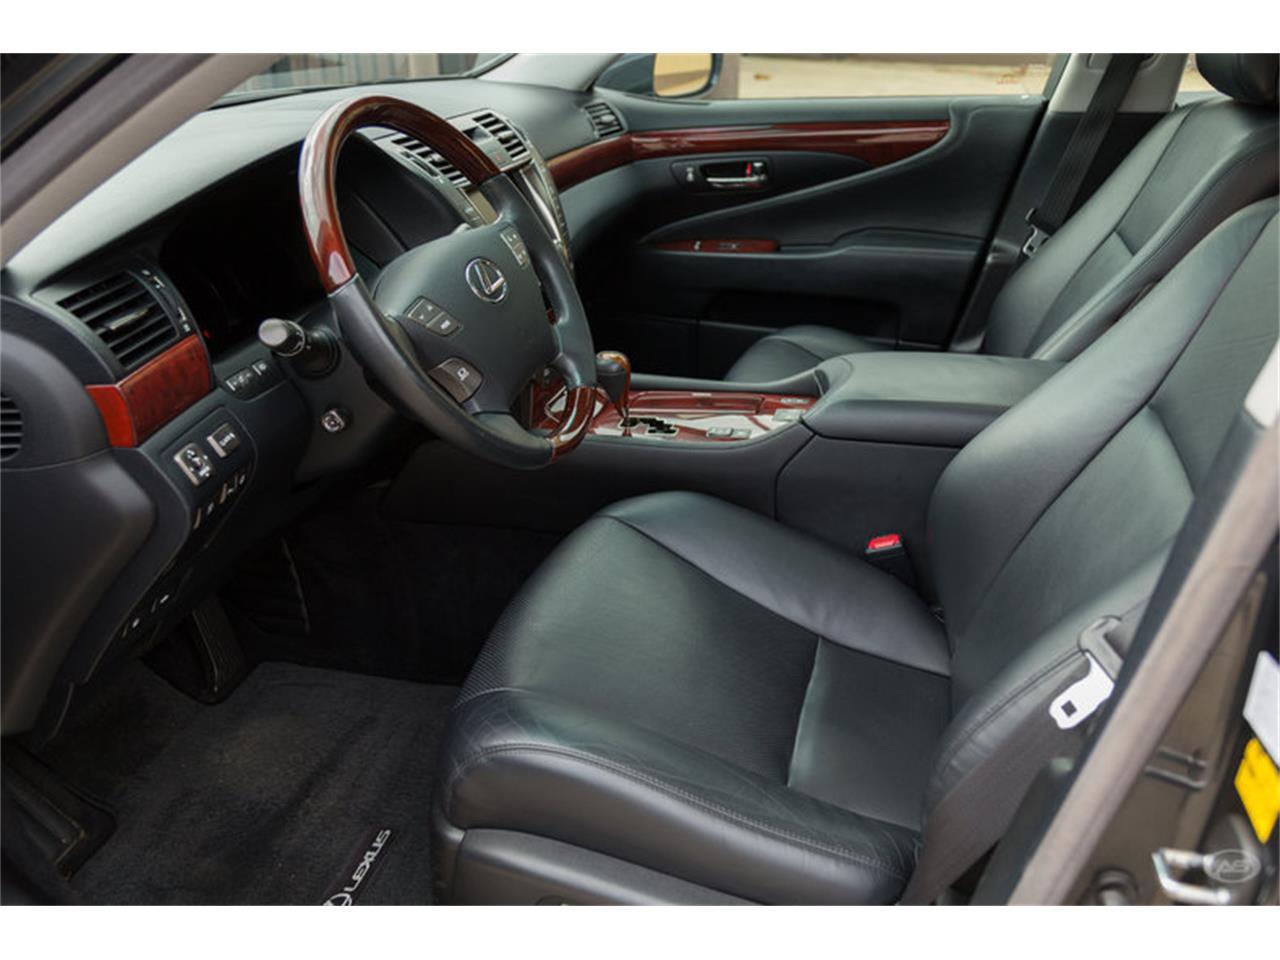 Large Picture of '08 Lexus LS460 - $19,900.00 - L6Q7